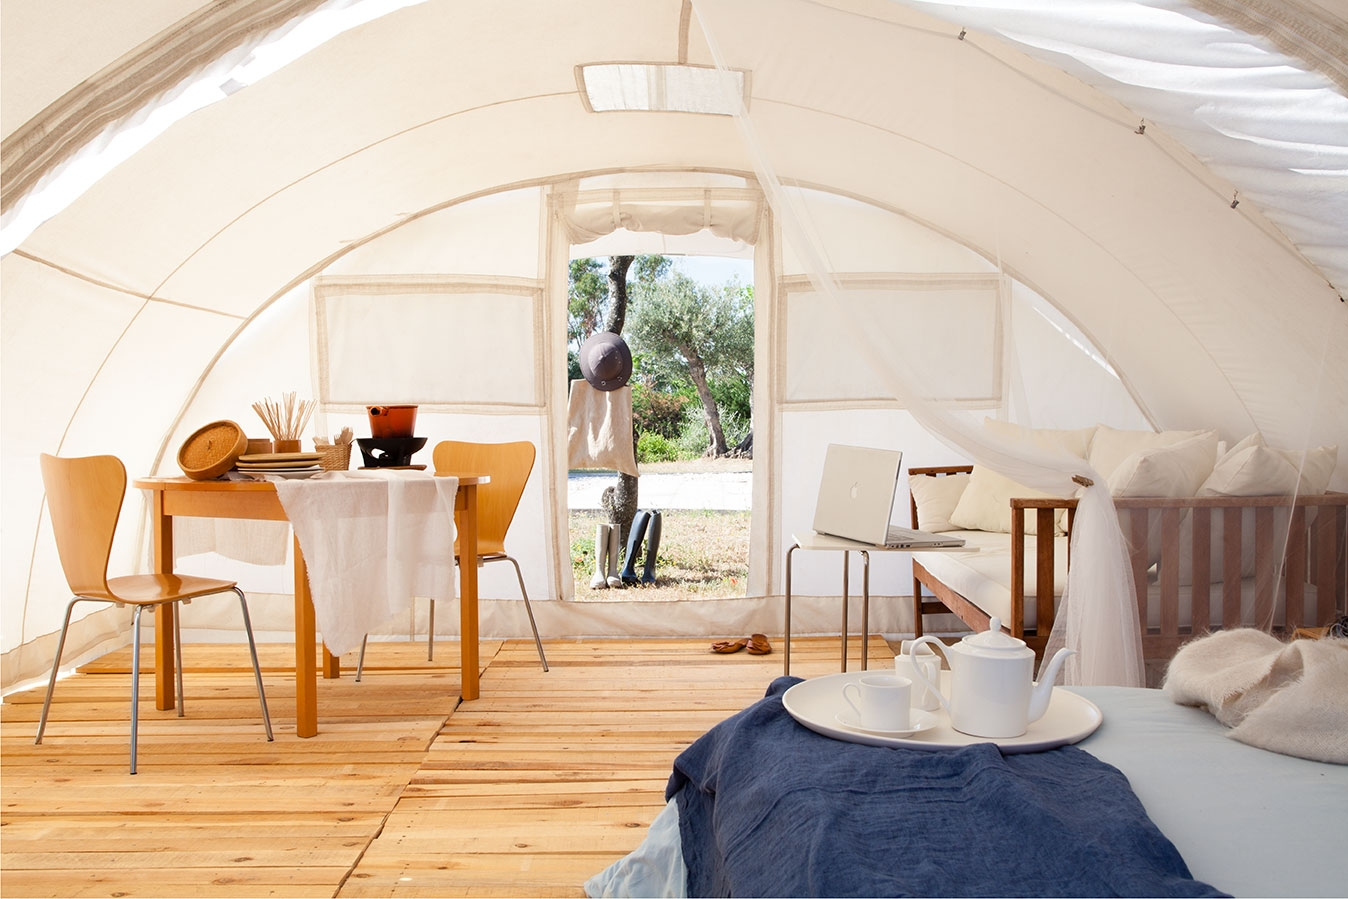 Ctents, luxury tent plenty of free space inside